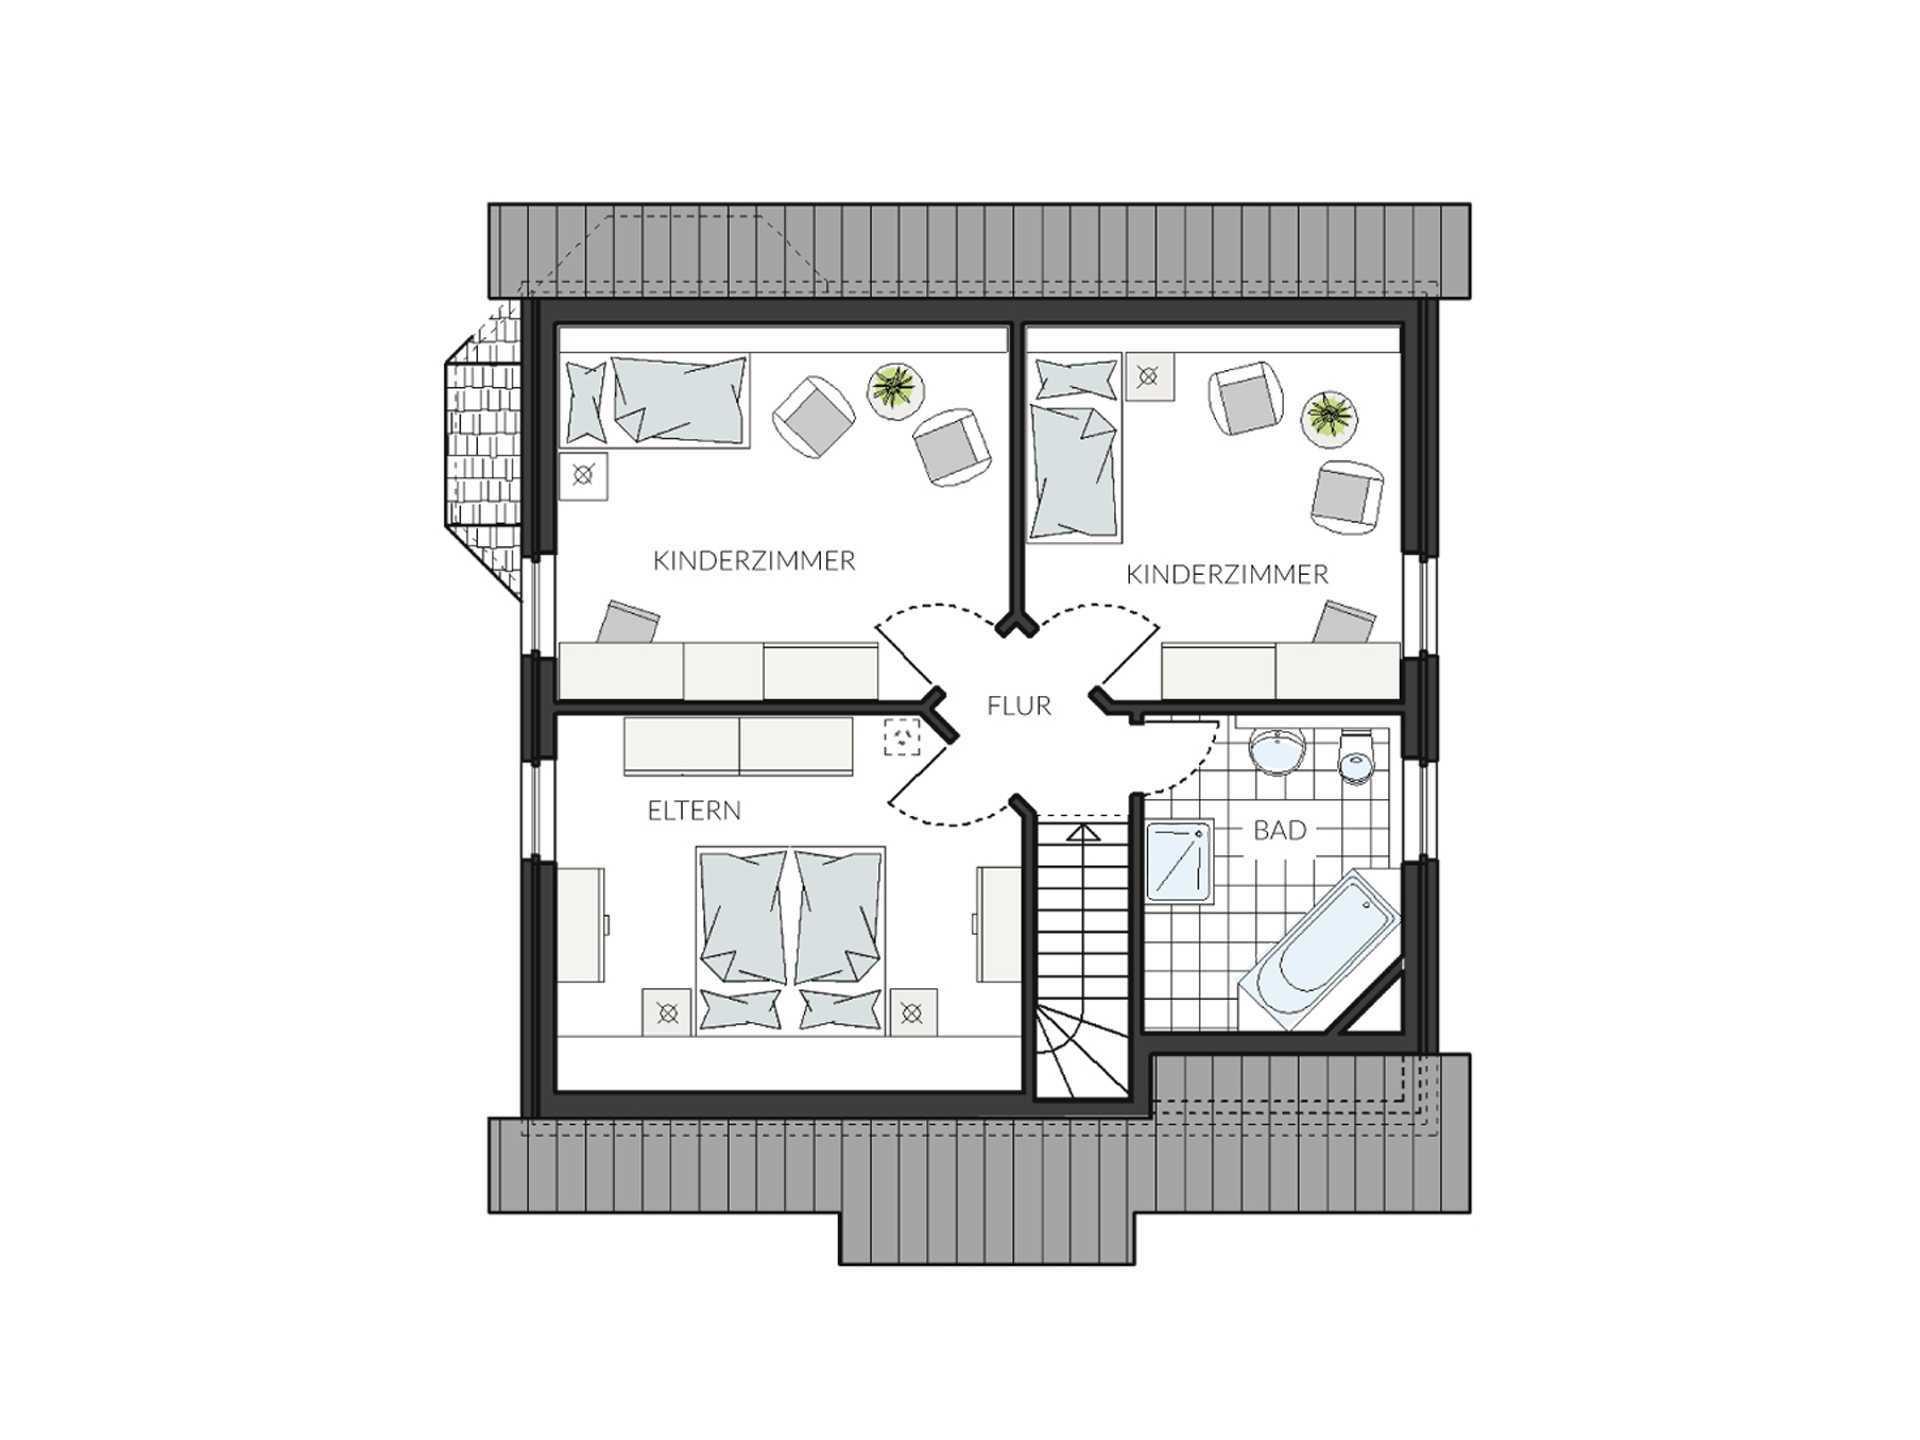 Einfamilienhaus ProFamily 137 Grundriss DG